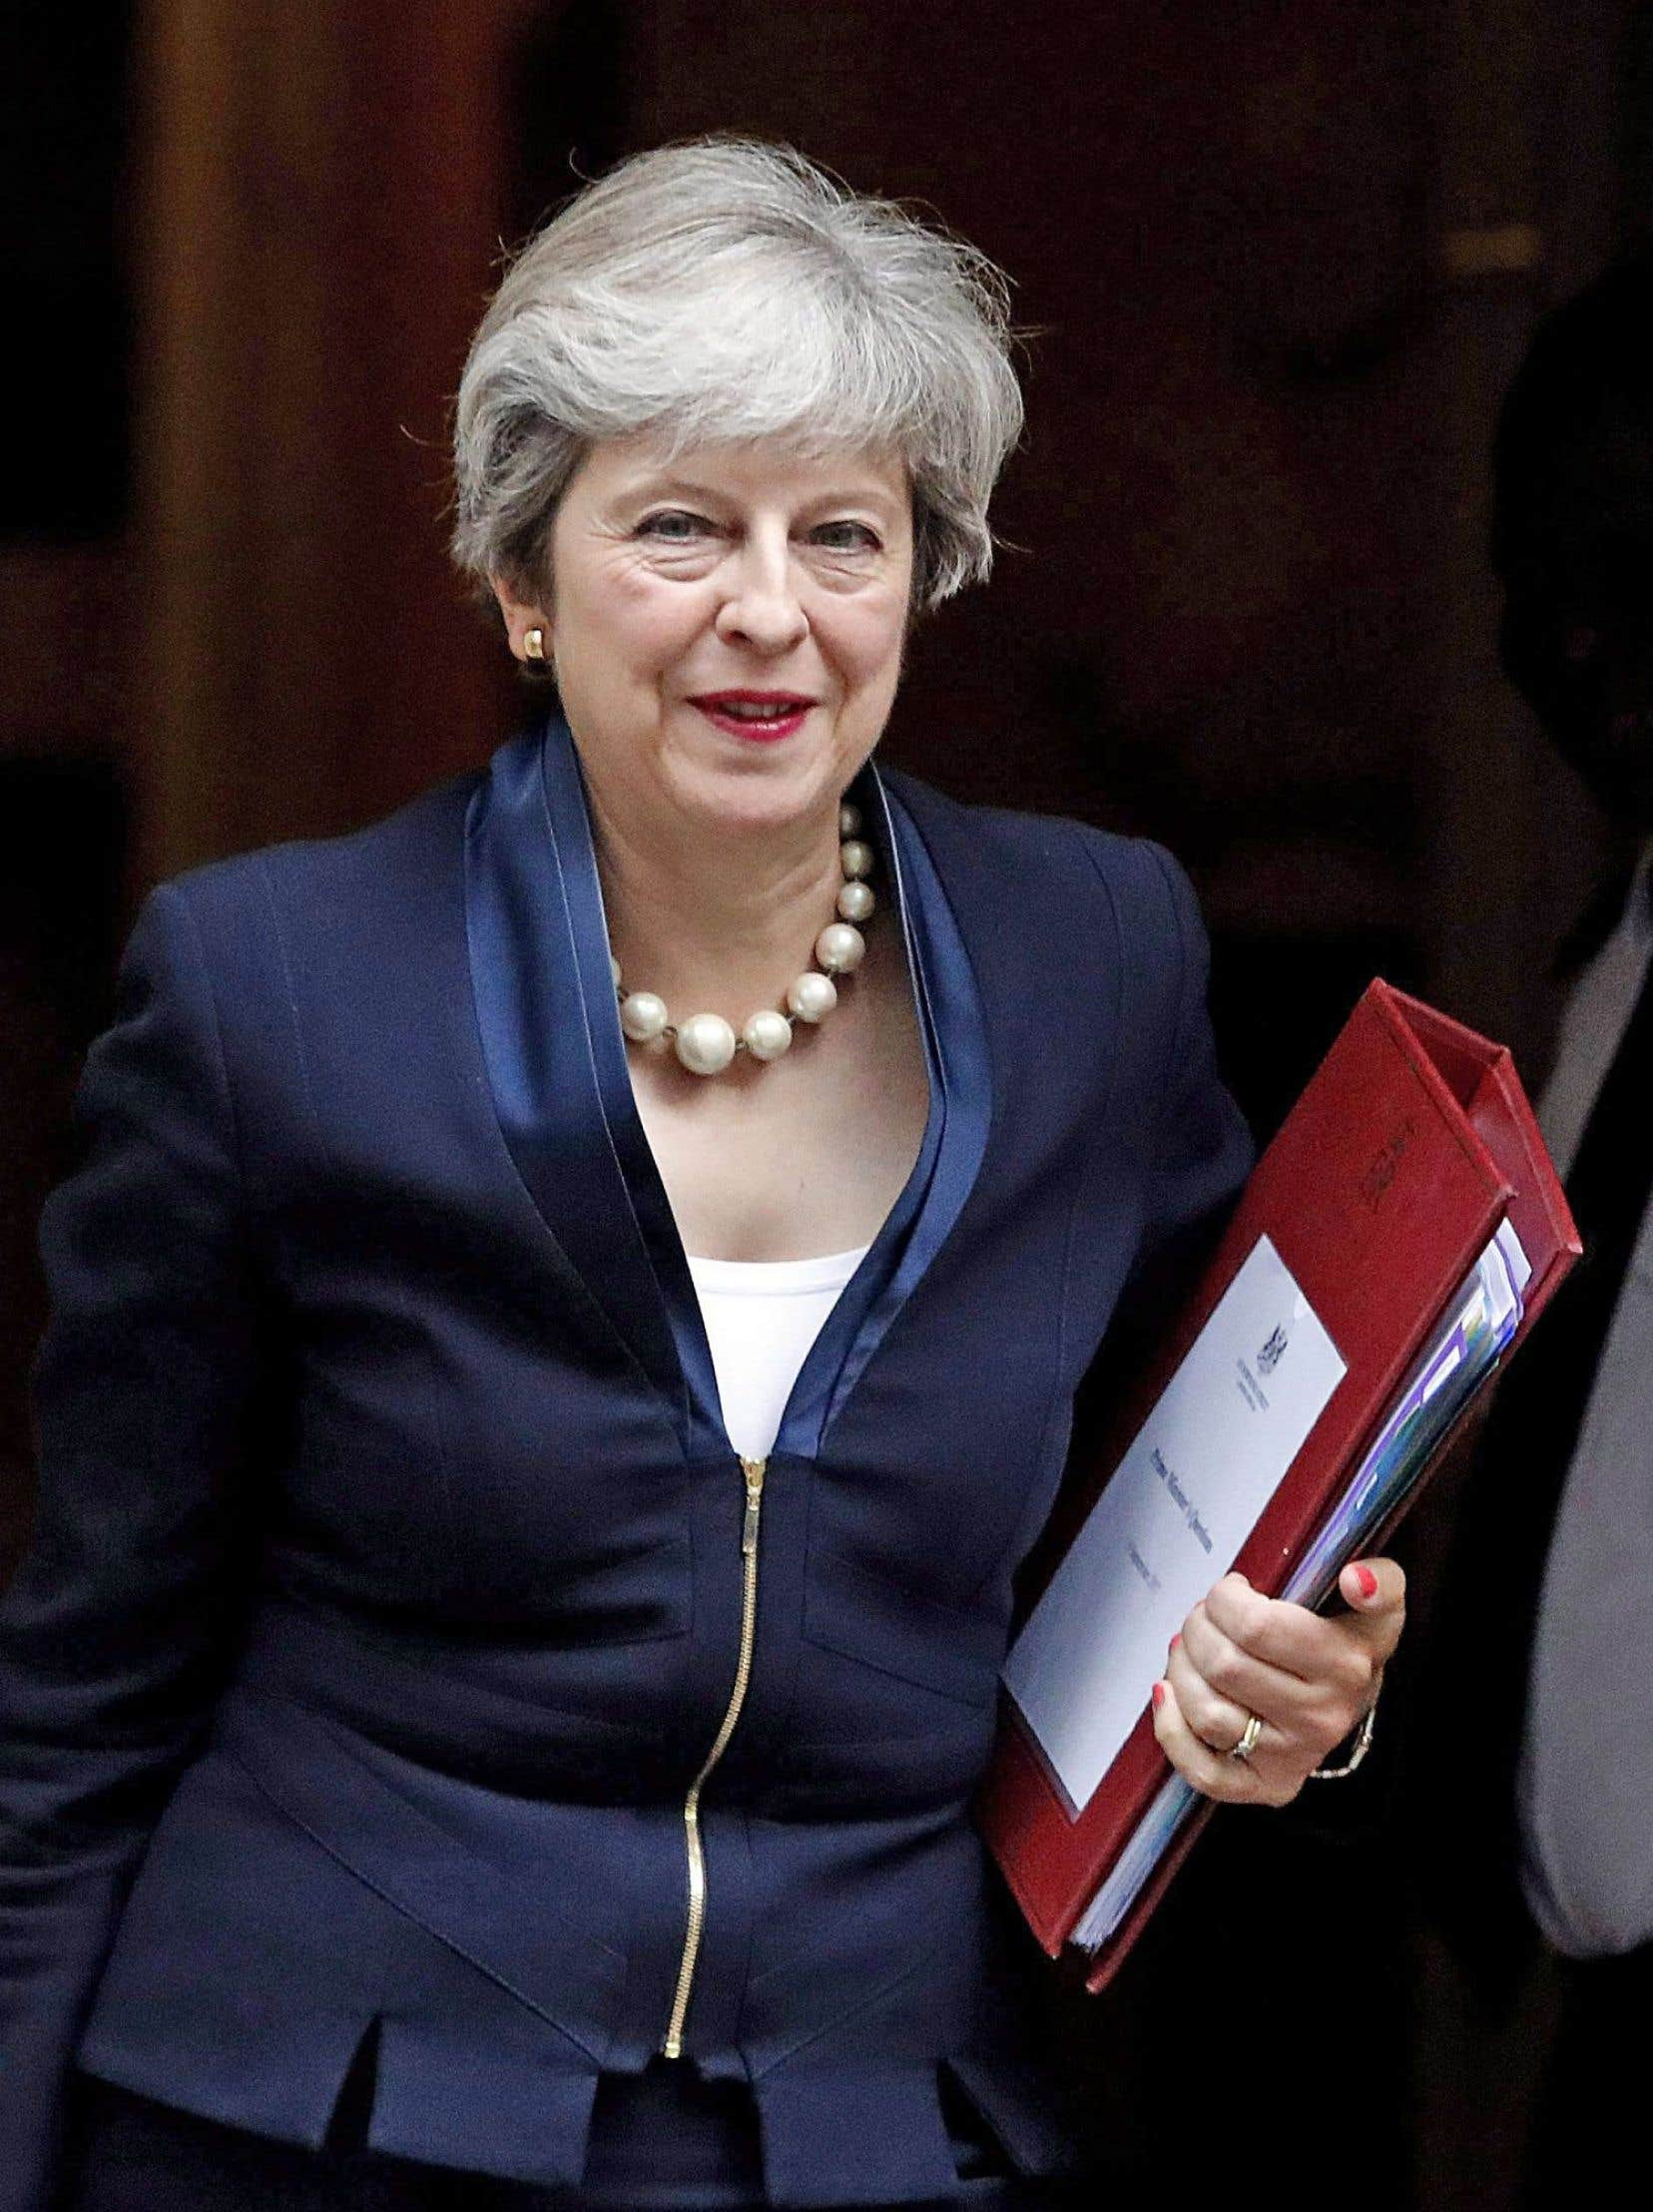 La première ministre du Royaume-Uni sera au Canada lundi et s'entrediendra avec Justin Trudeau.